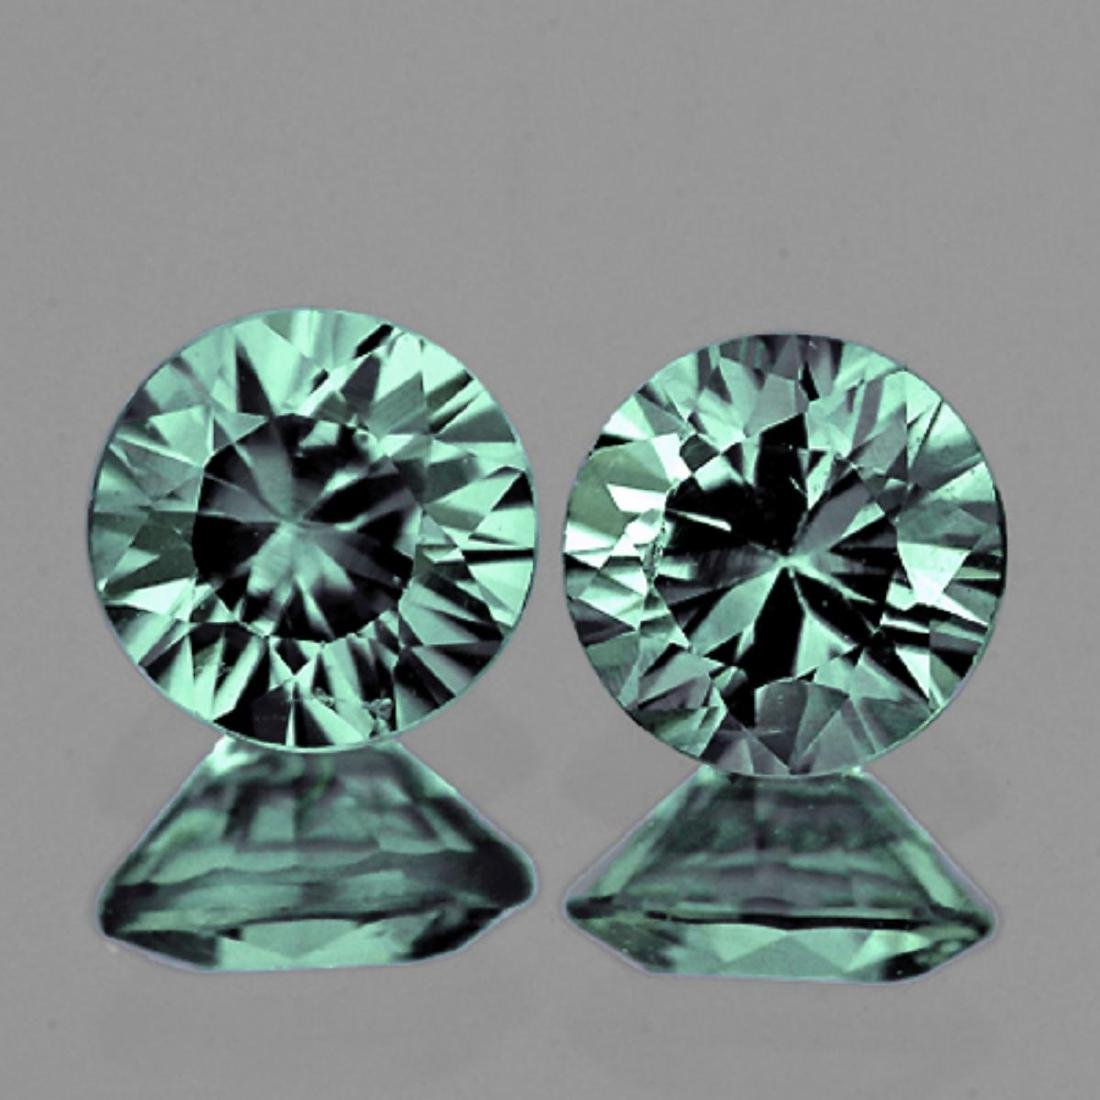 Natural Bluish Green Sapphire Pair (Flawless-VVS1)